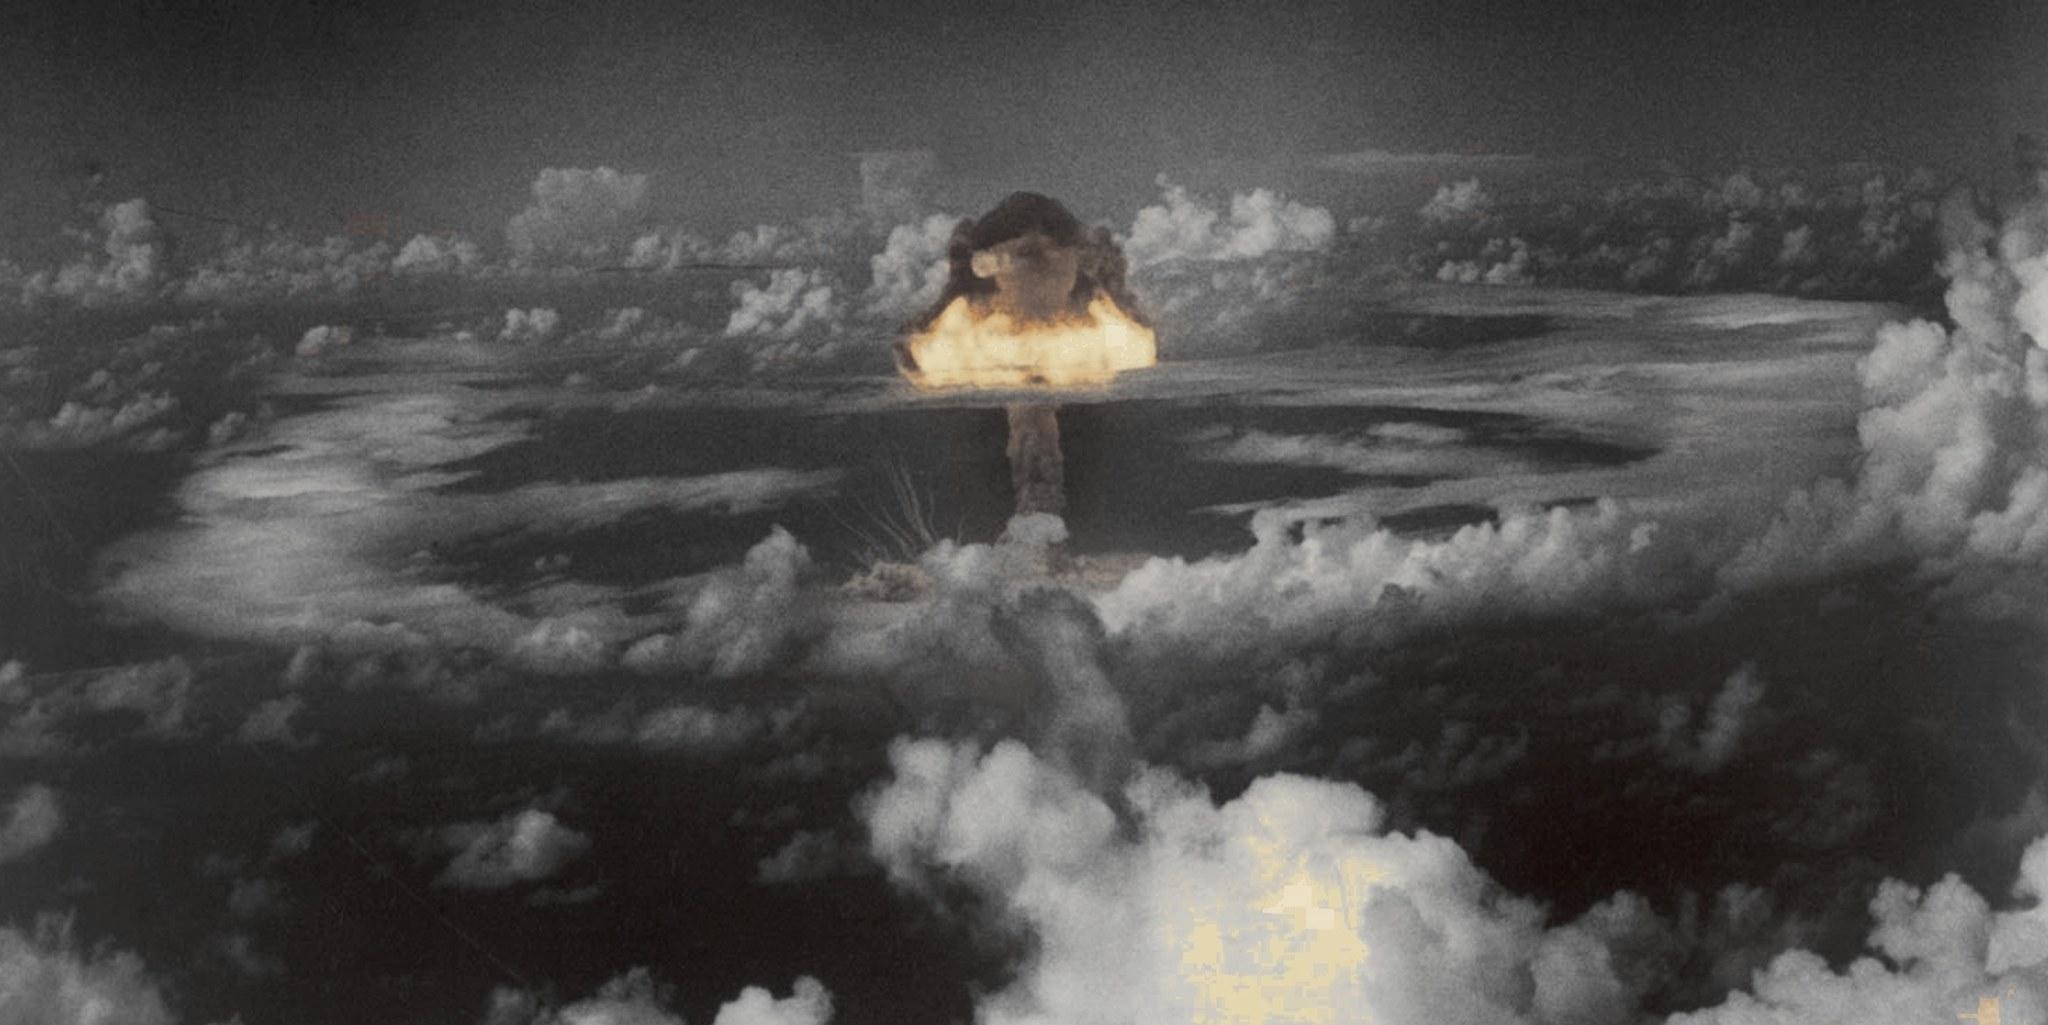 Nuclear.jpg (JPEG Image, 1474×1180 pixels)